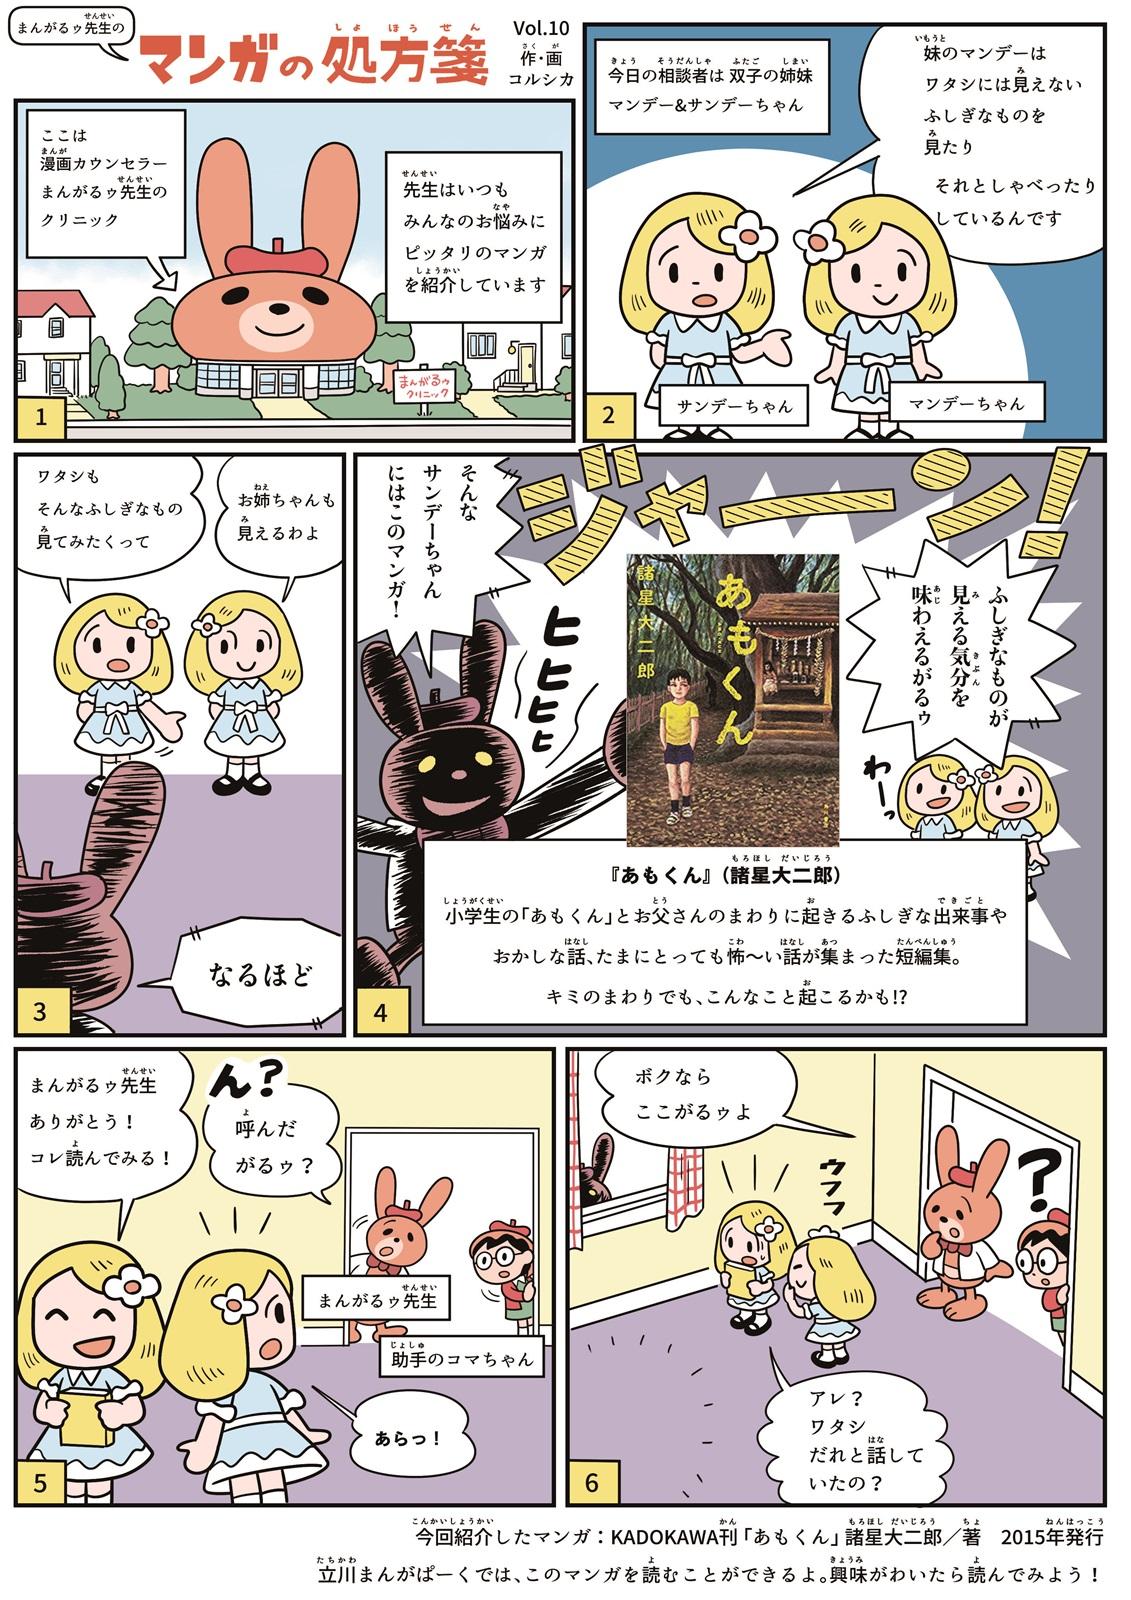 https://mangapark.jp/topics/2019/06/30/images/mangaroosensei_vol10.jpg